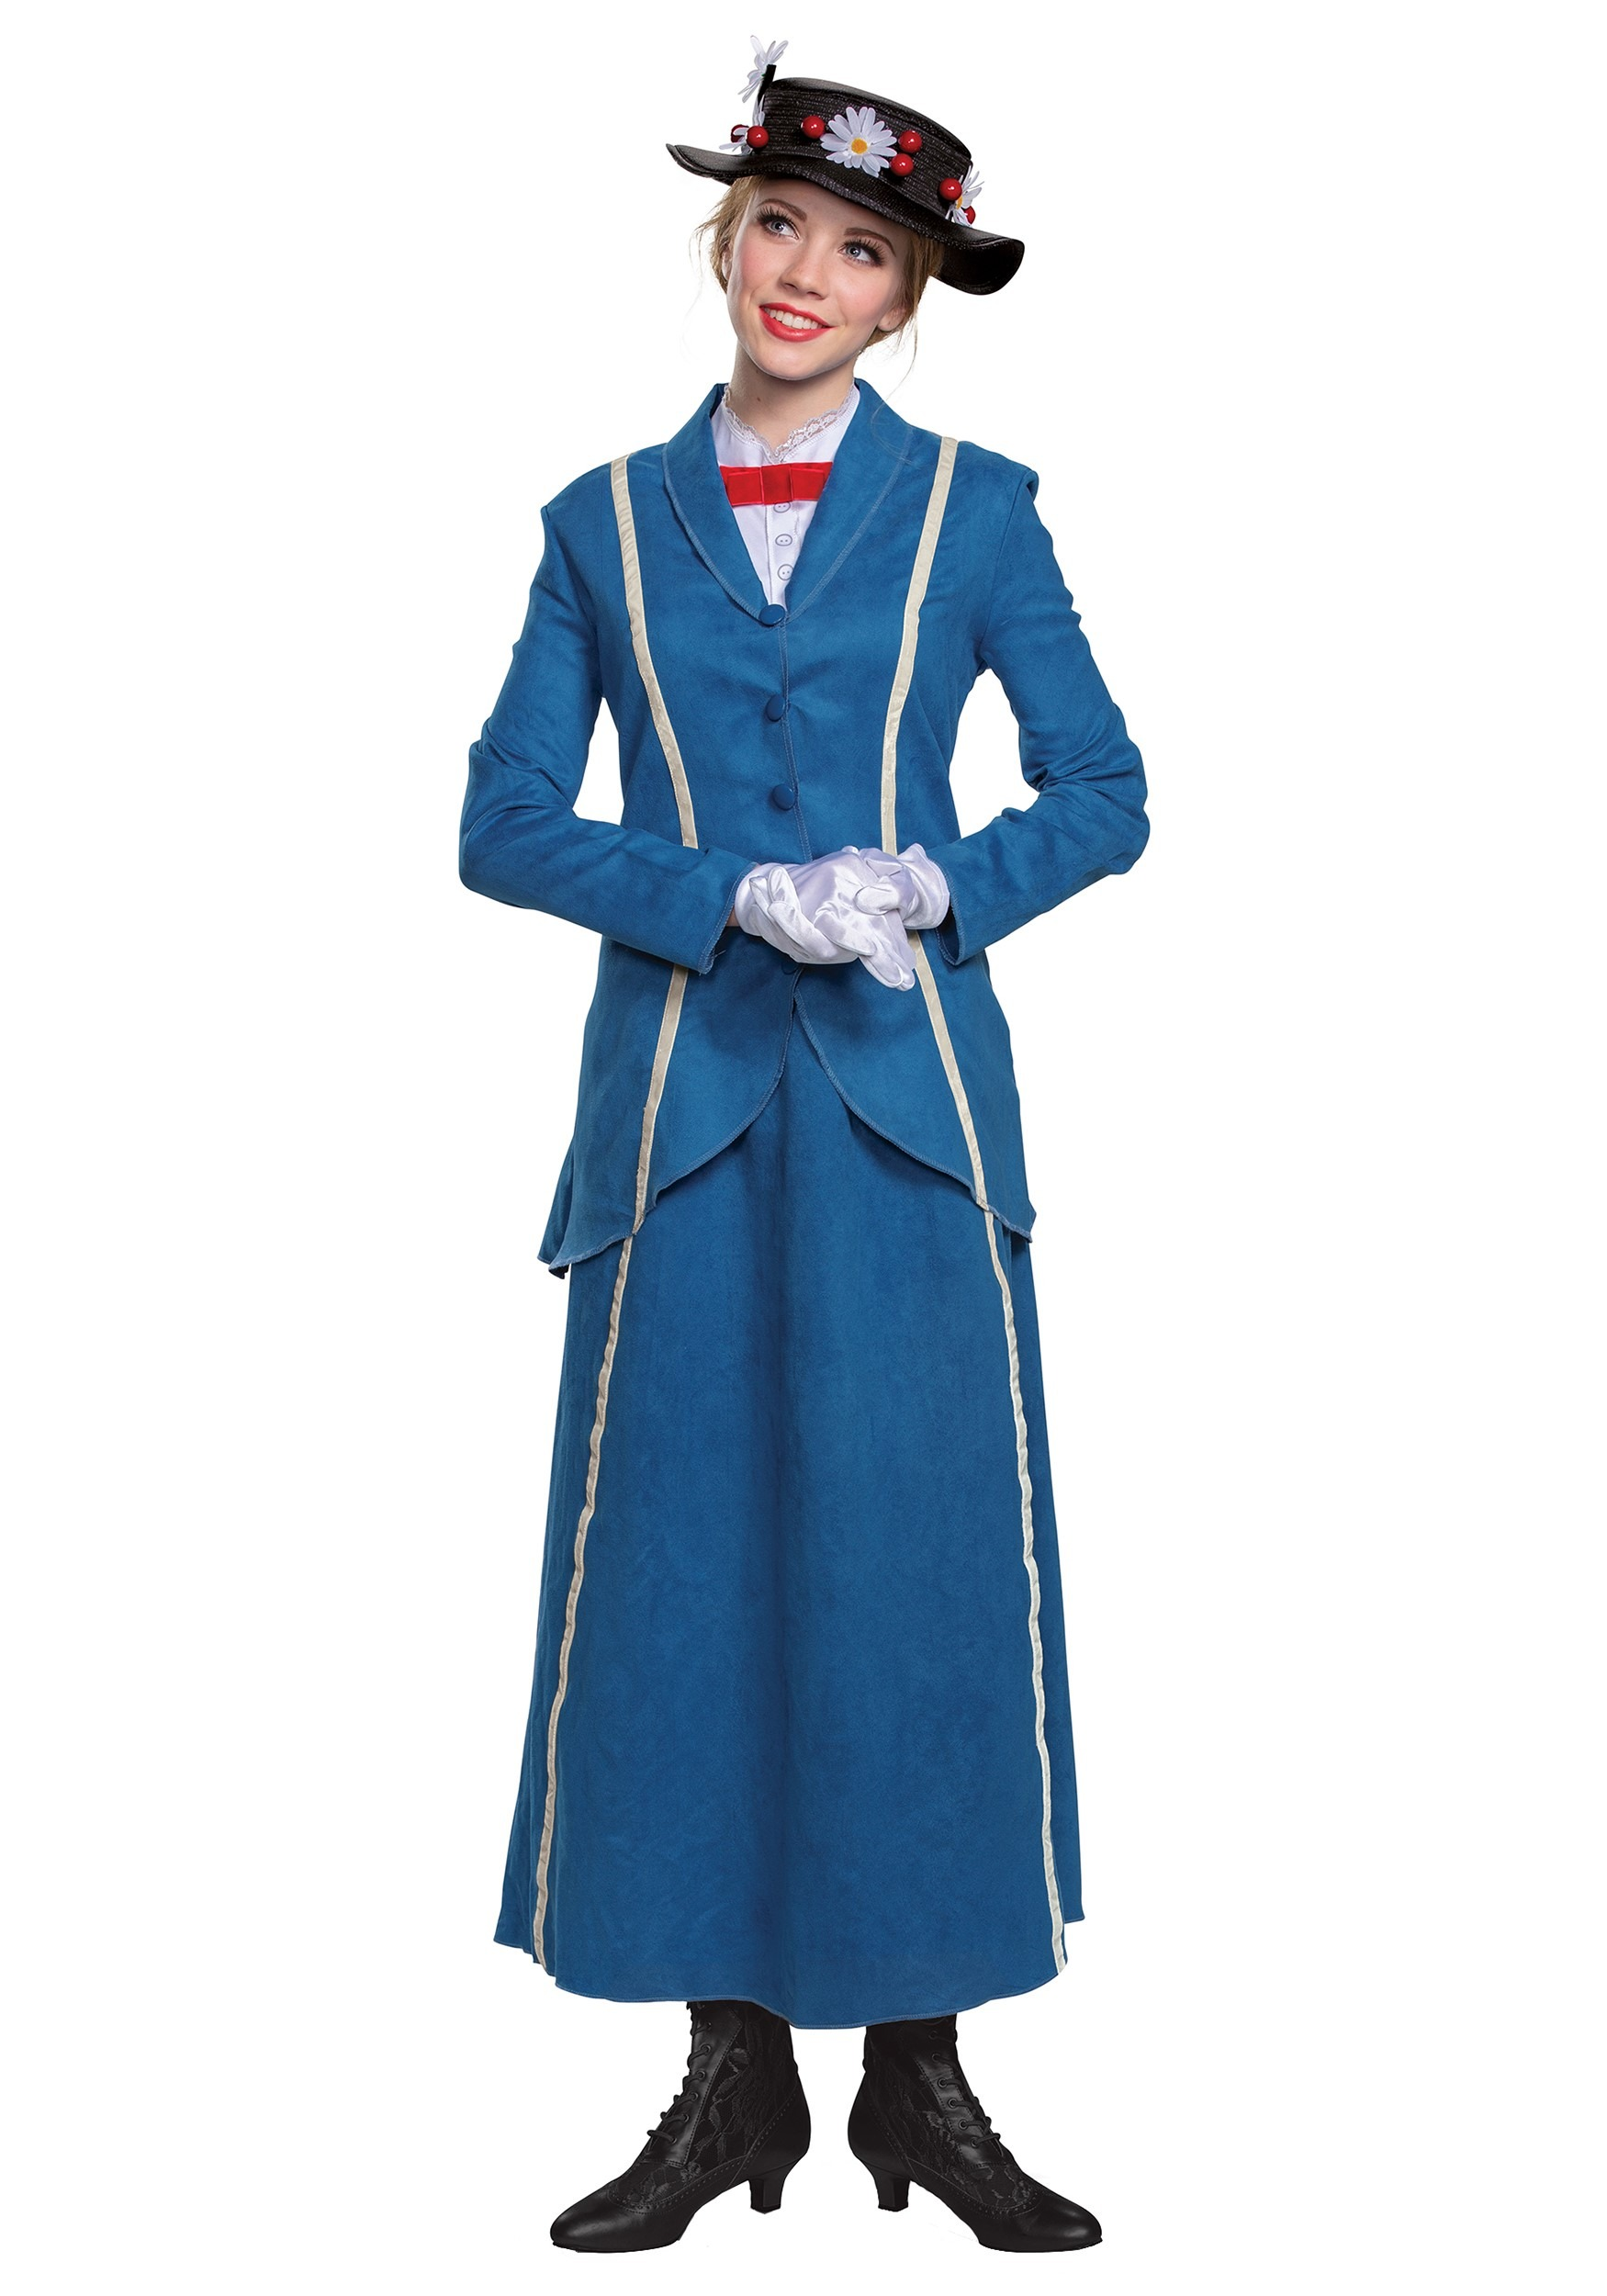 Mary Poppins Women's Blue Coat Costume